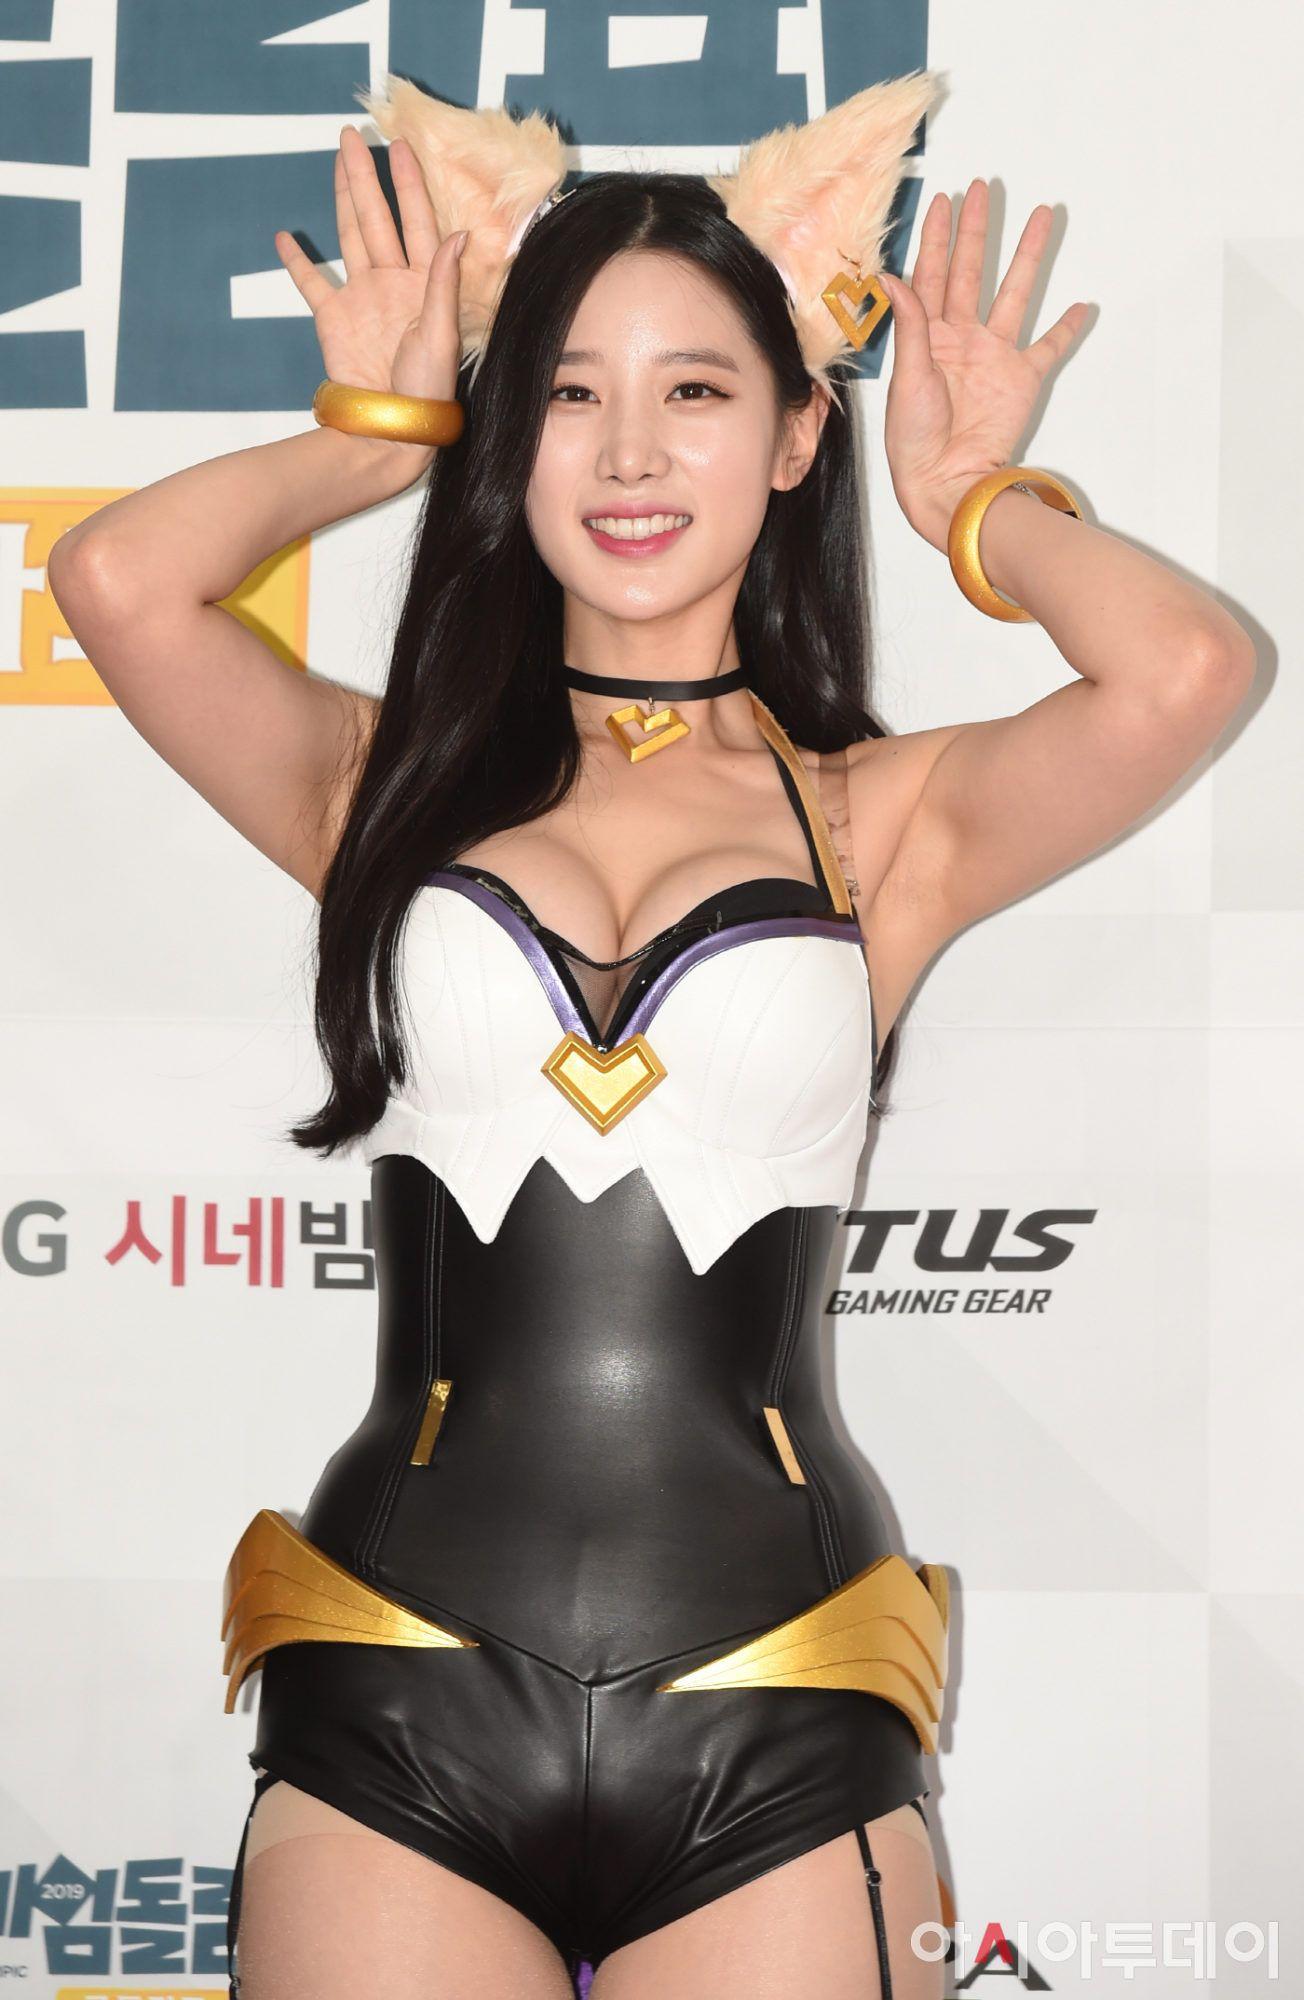 Berry Good Johyun League Of Legends Ahri Cosplay Photos Hd Hr In 2021 Cosplay Kpop Girls League Of Legends